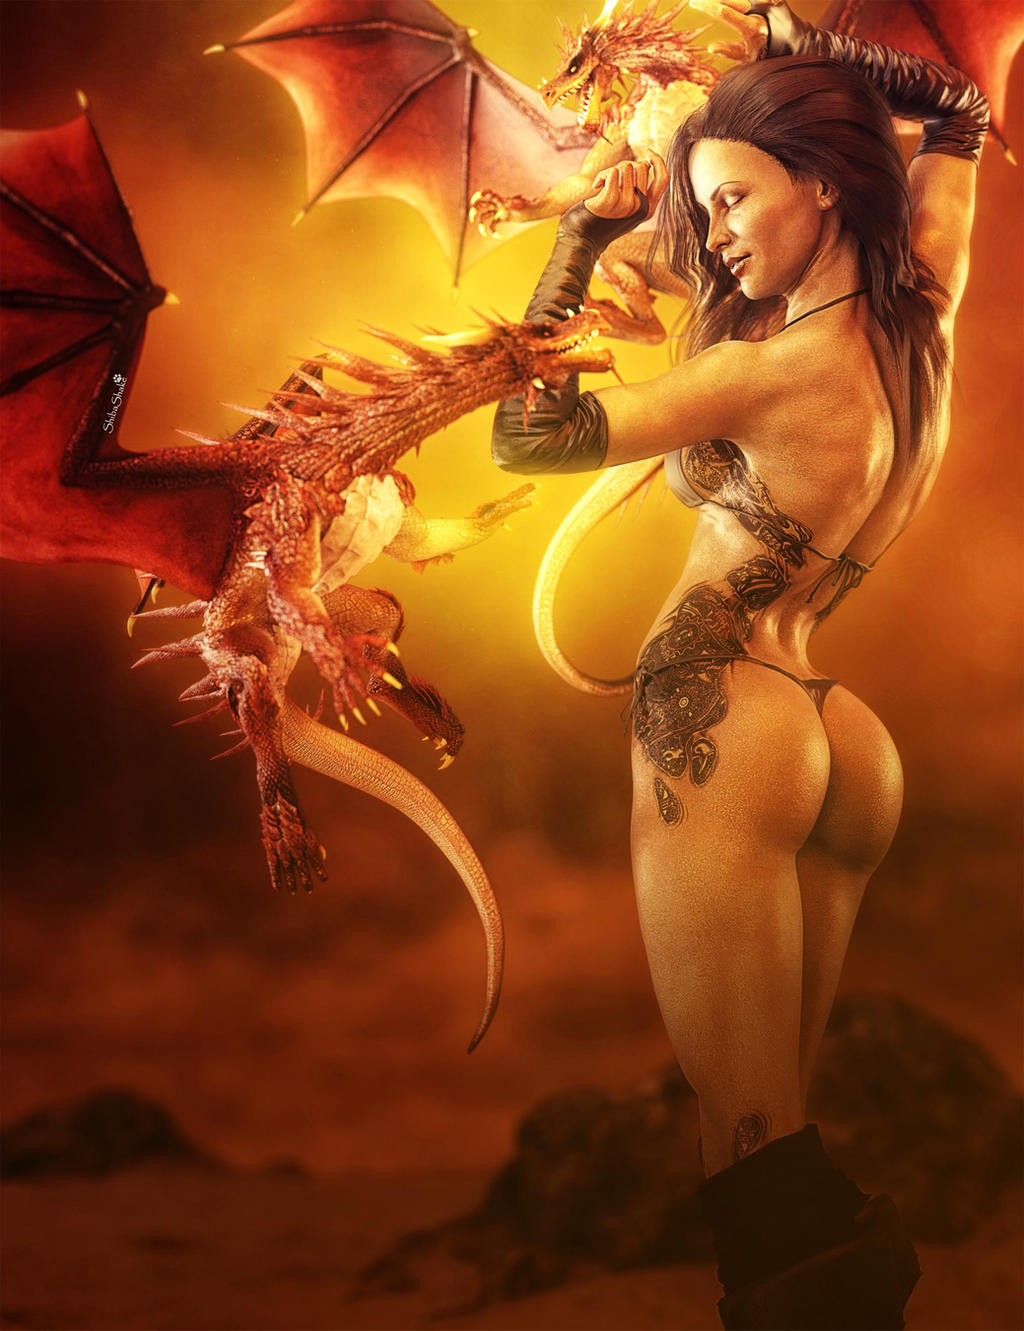 Dark hairedwoman dancing with dragons fantasy art by shibashake dark hairedwoman dancing with dragons fantasy art by shibashake voltagebd Images